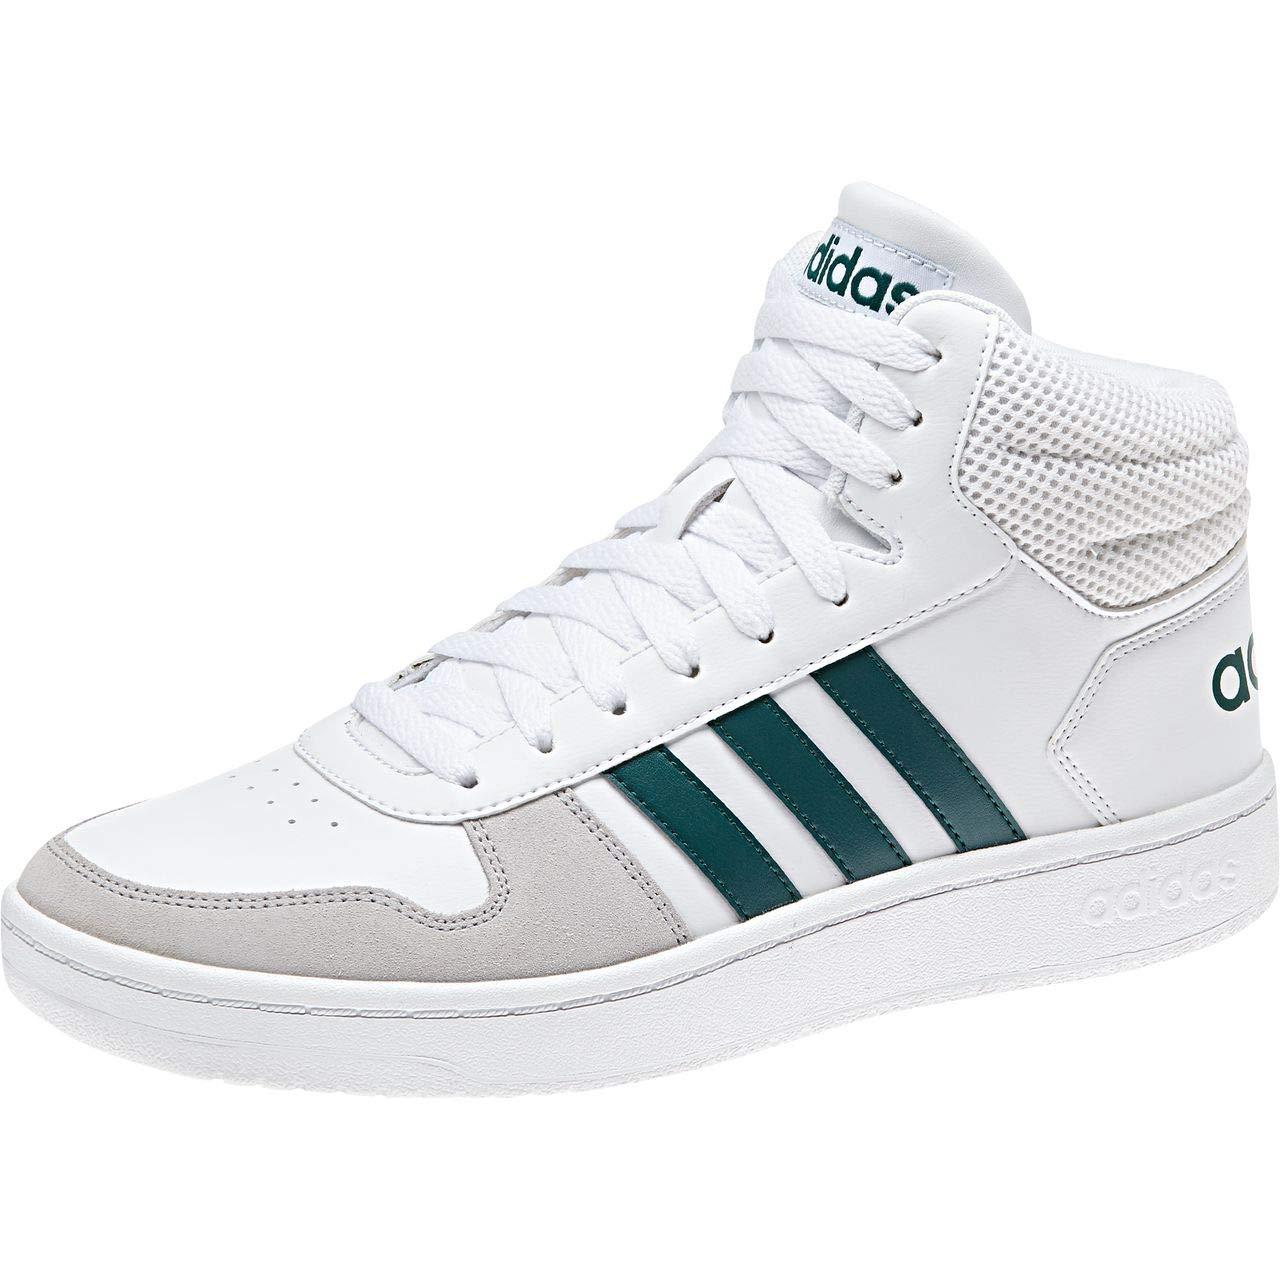 Blanc (Ftwbla Vernob Gridos 0) adidas Hoops 2.0 Mid, Chaussures de Fitness Homme 45 1 3 EU